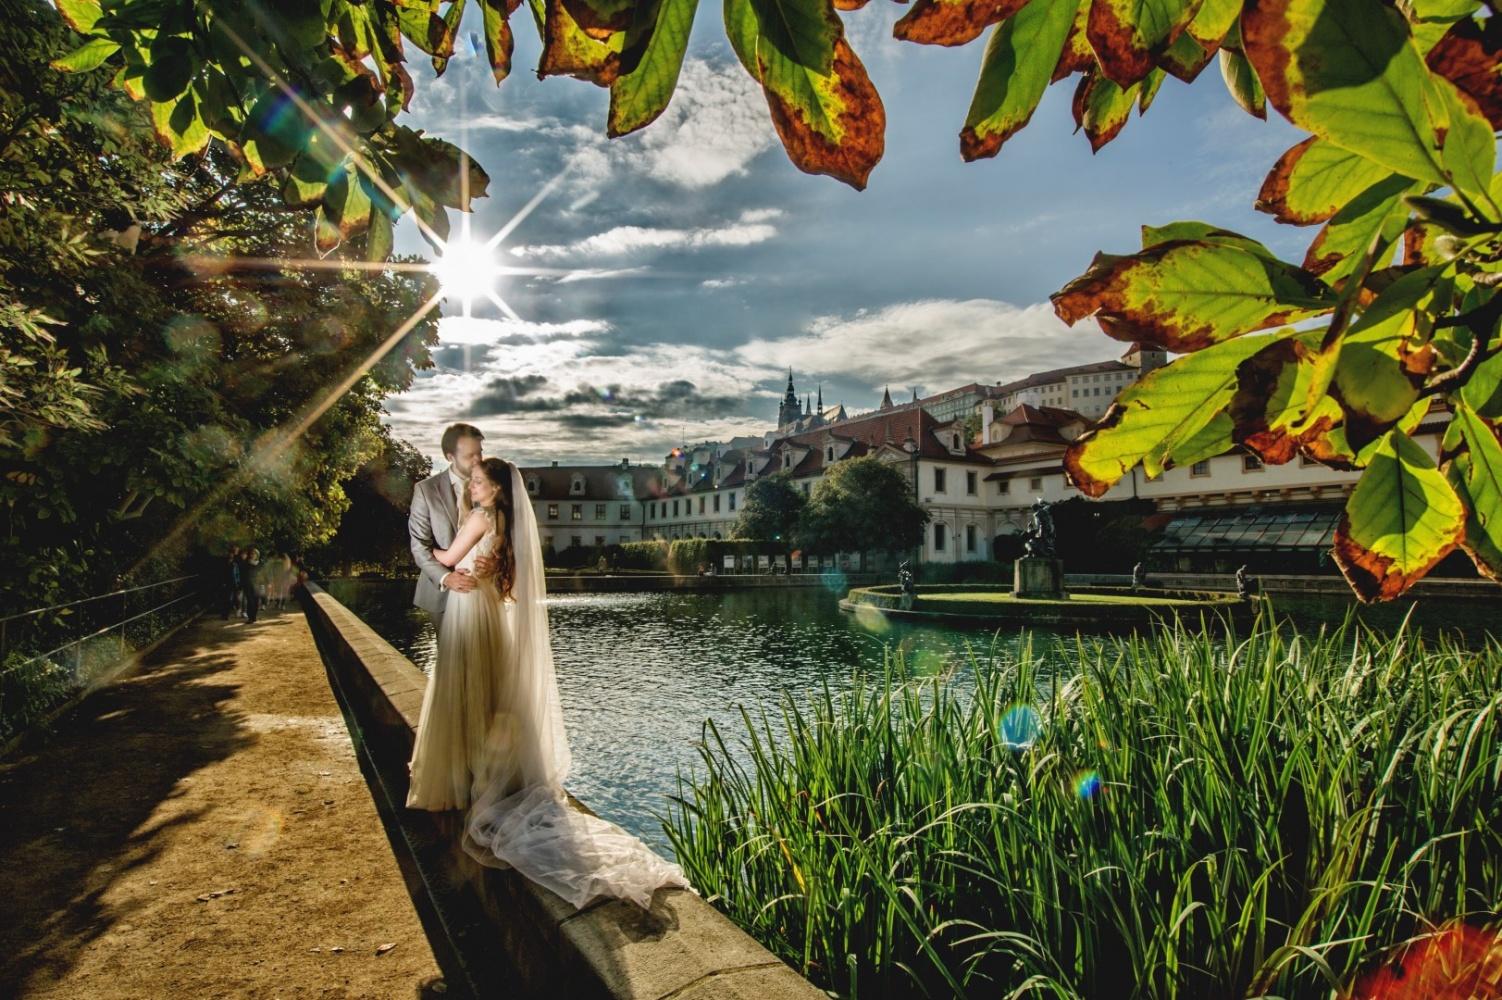 http://www.fotoz.sk/images/gallery-36/normal/svadobny-fotograf_eskuvoi-fotos_lacny-fotograf_fotograf-na-svadbu_plauter-kuria_fotograf-nitra_fotograf-galanta_juraj-zsok058.jpg